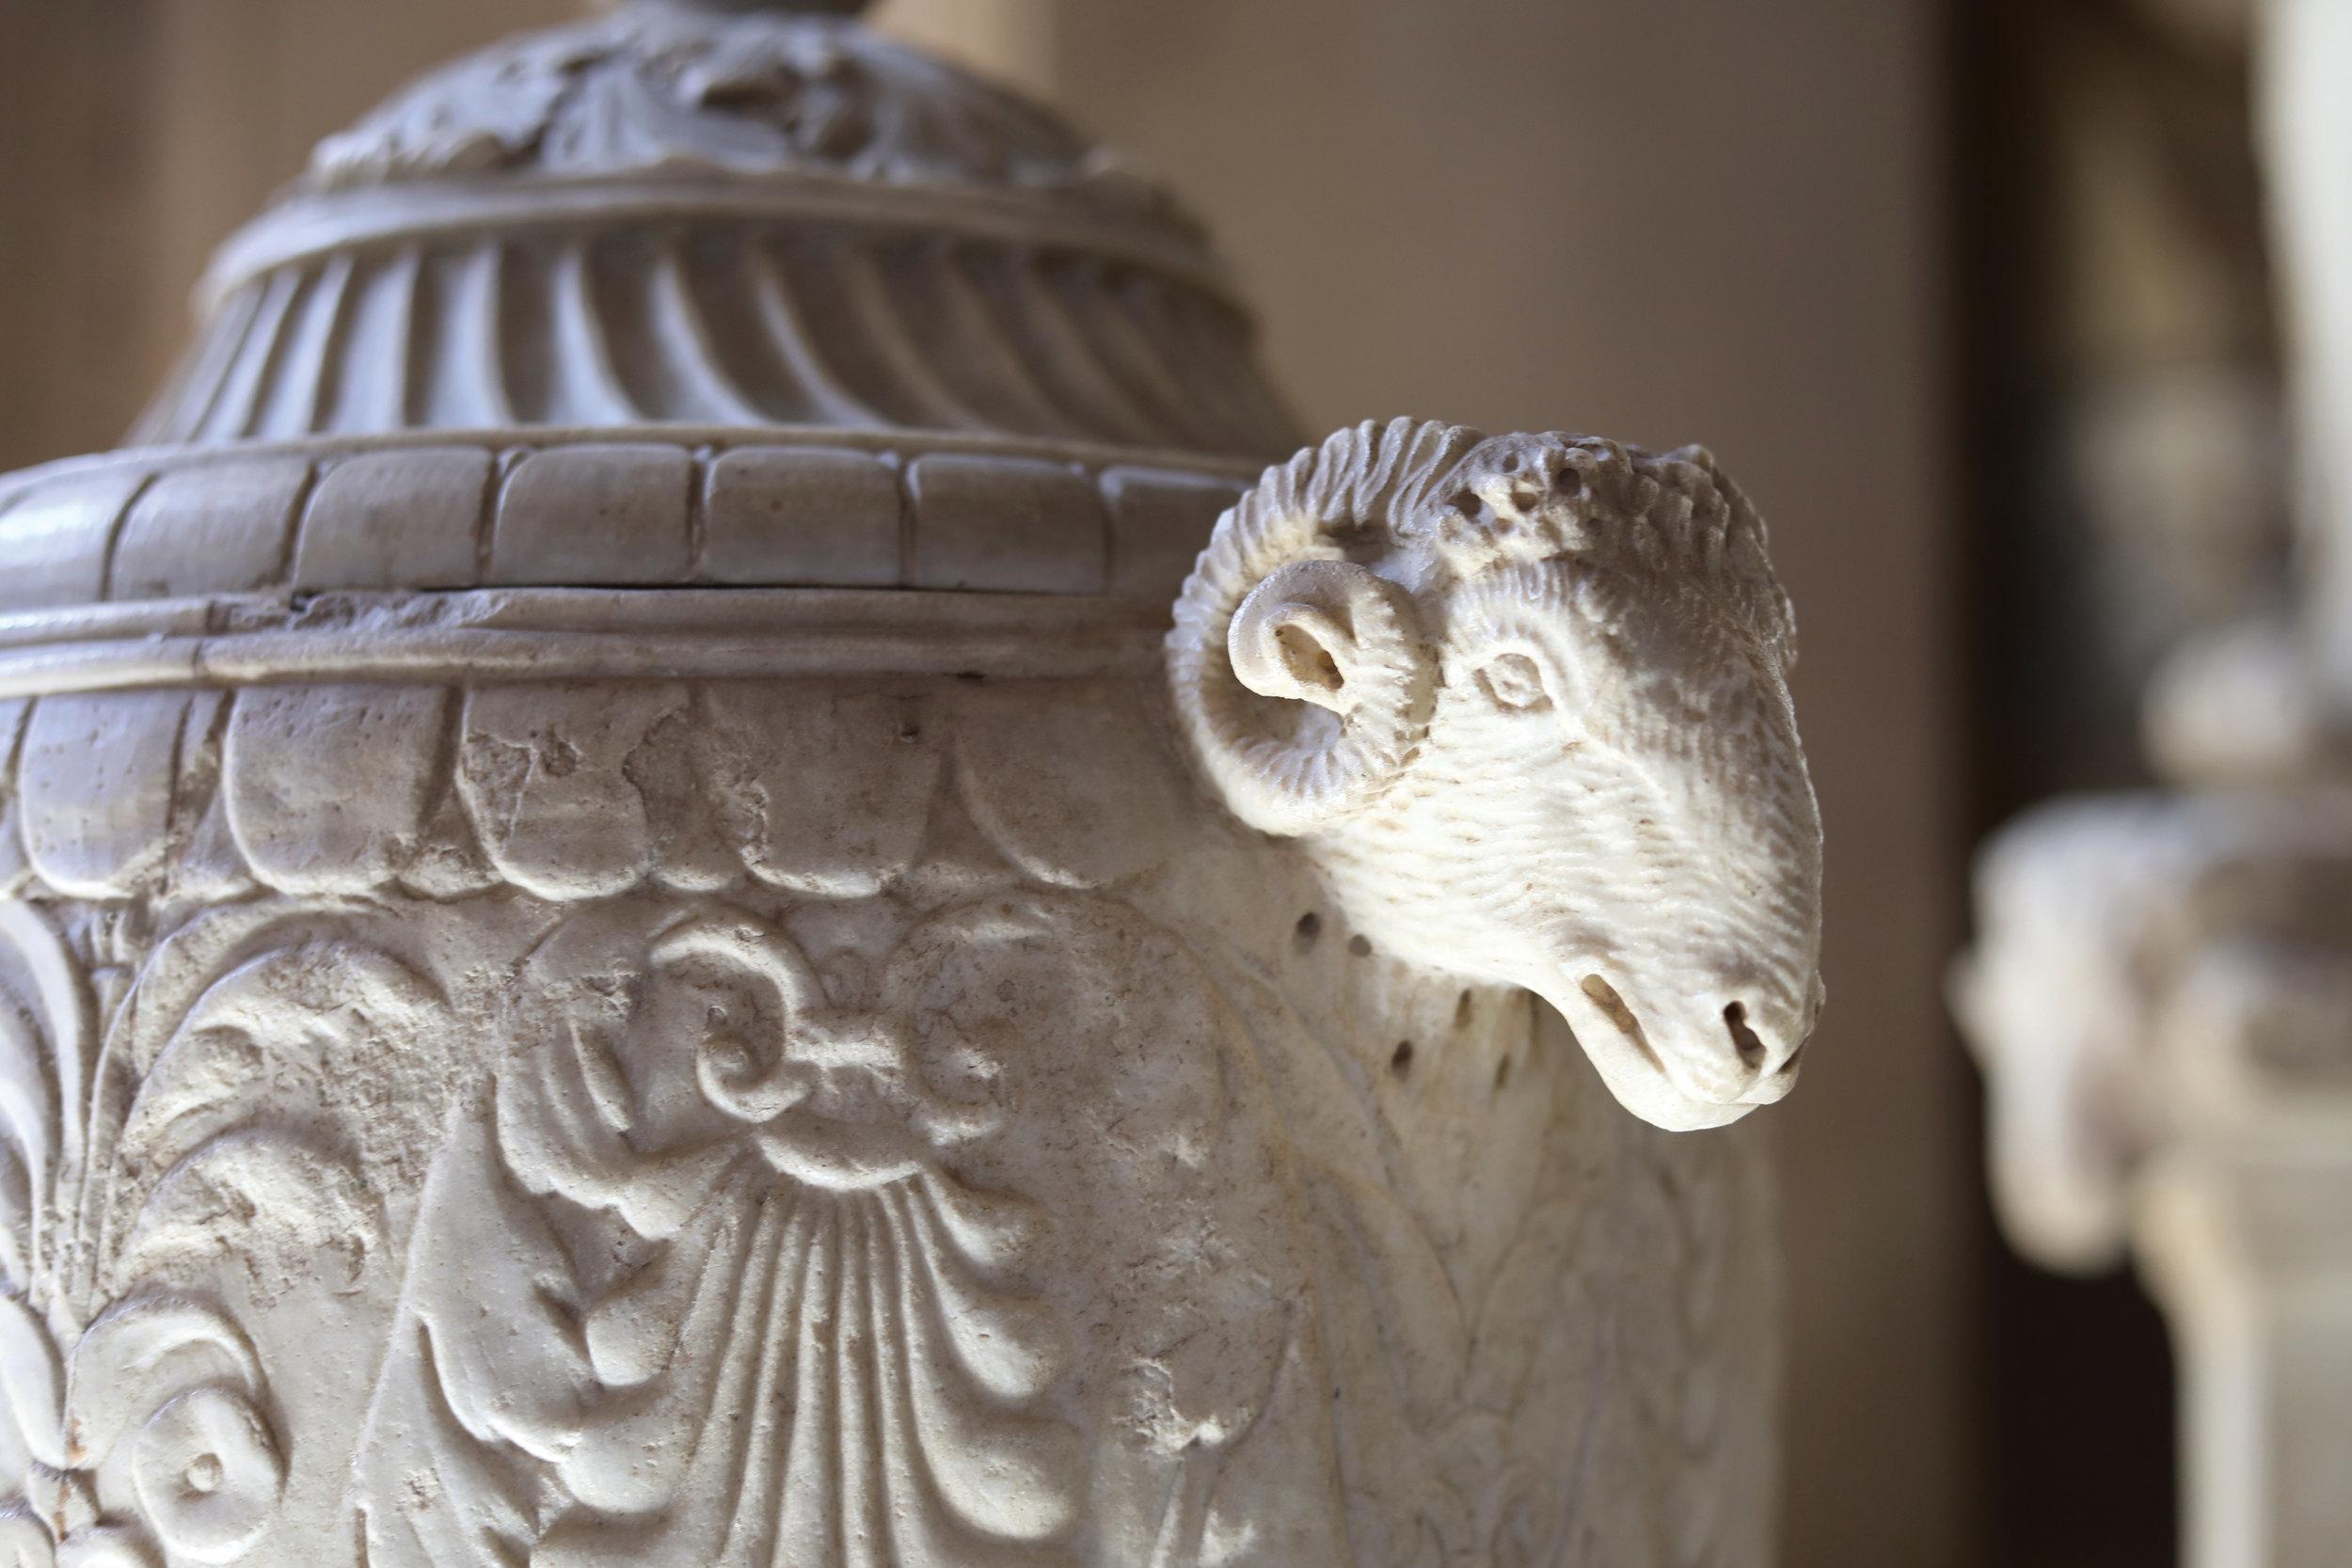 Urn in The Vatican Museum, Rome, Italy   https://www.ebay.com/itm/263679837731?ssPageName=STRK:MESELX:IT&_trksid=p3984.m1555.l2649